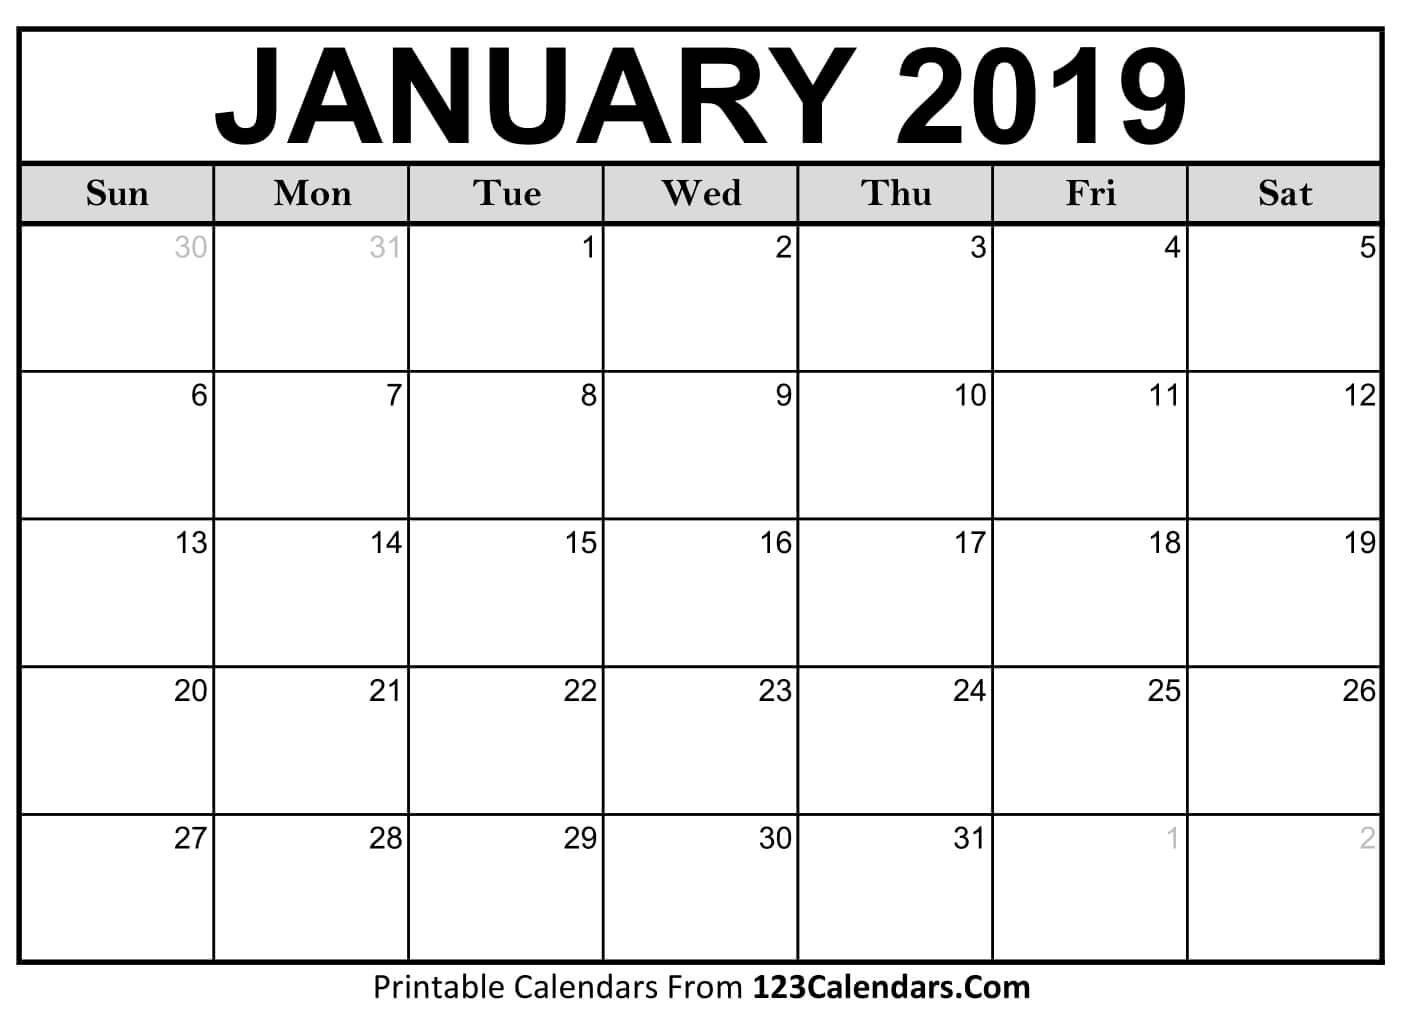 Printable January 2019 Calendar Templates - 123Calendars January 2 2019 Calendar